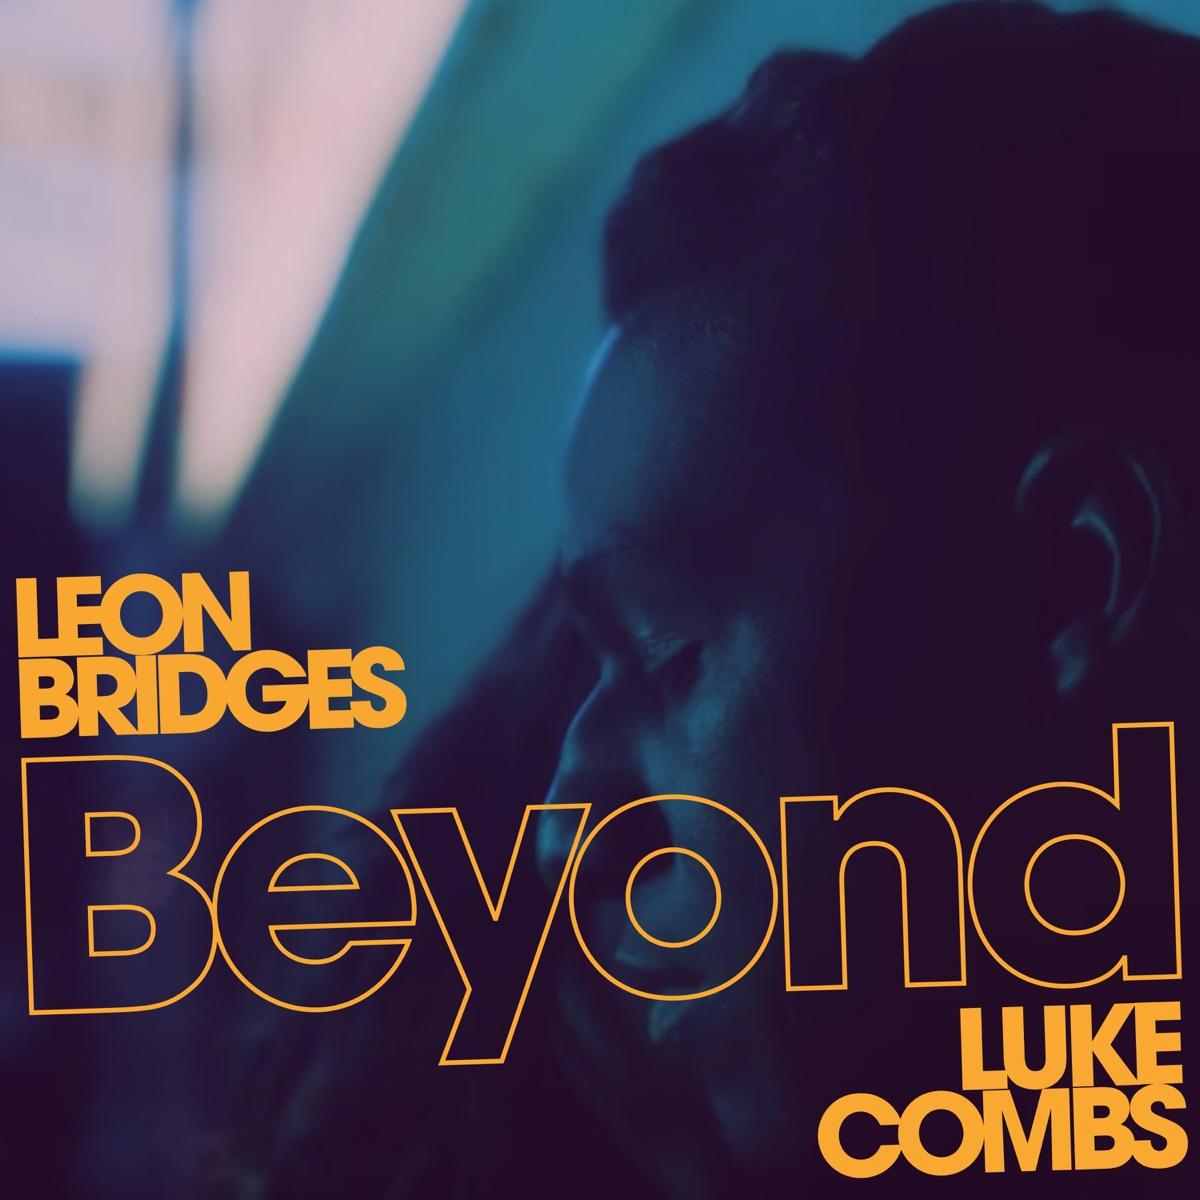 Beyond feat Luke Combs Live - Single Leon Bridges CD cover